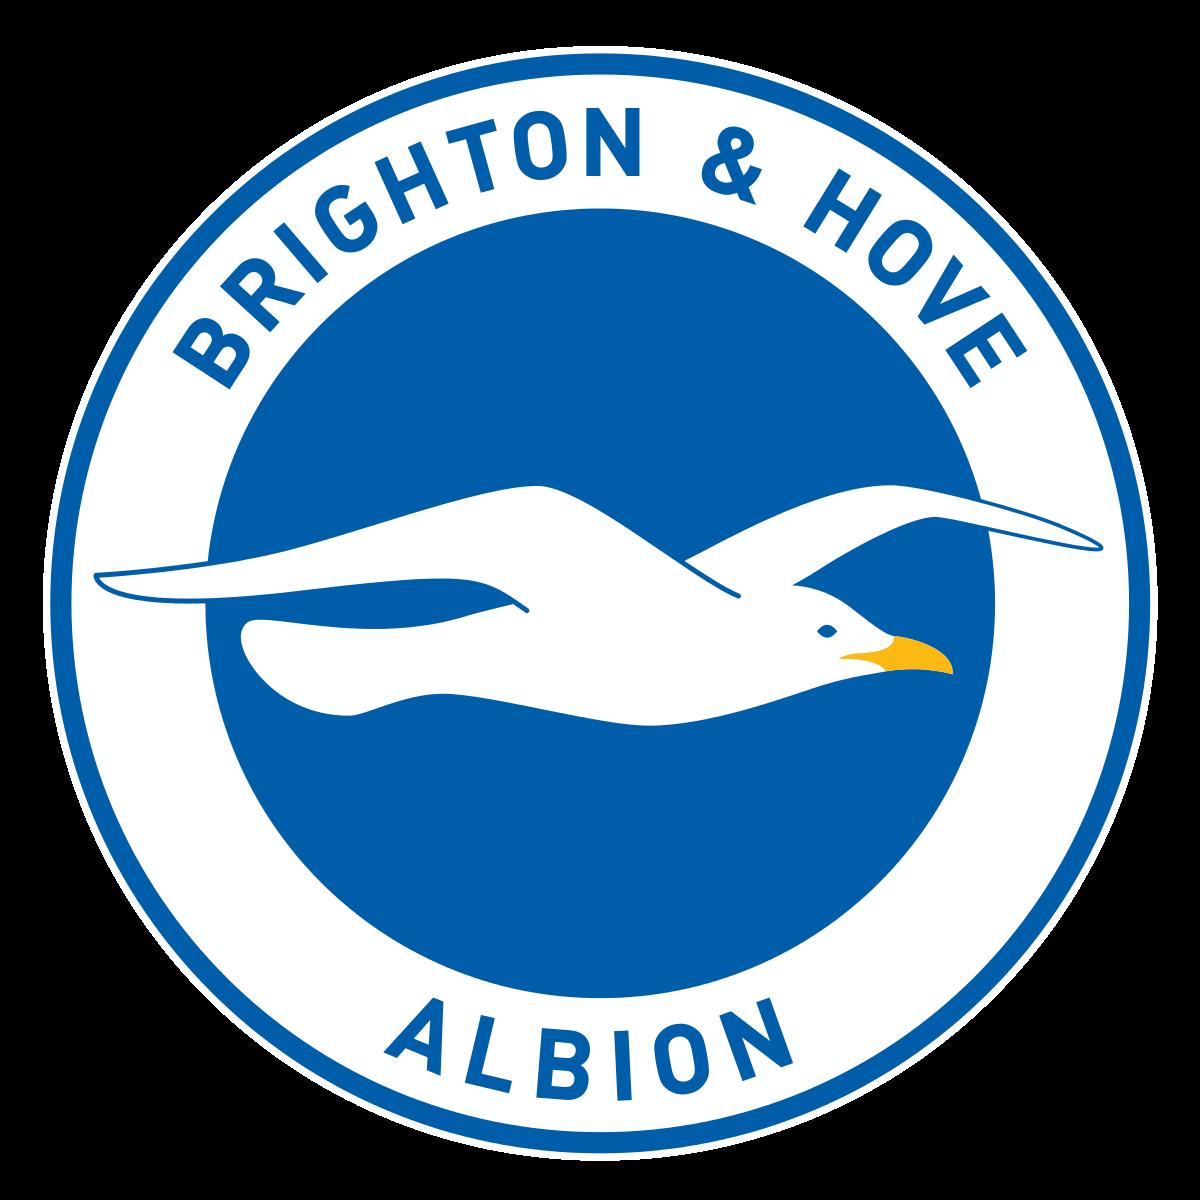 Brighton (u23) team logo